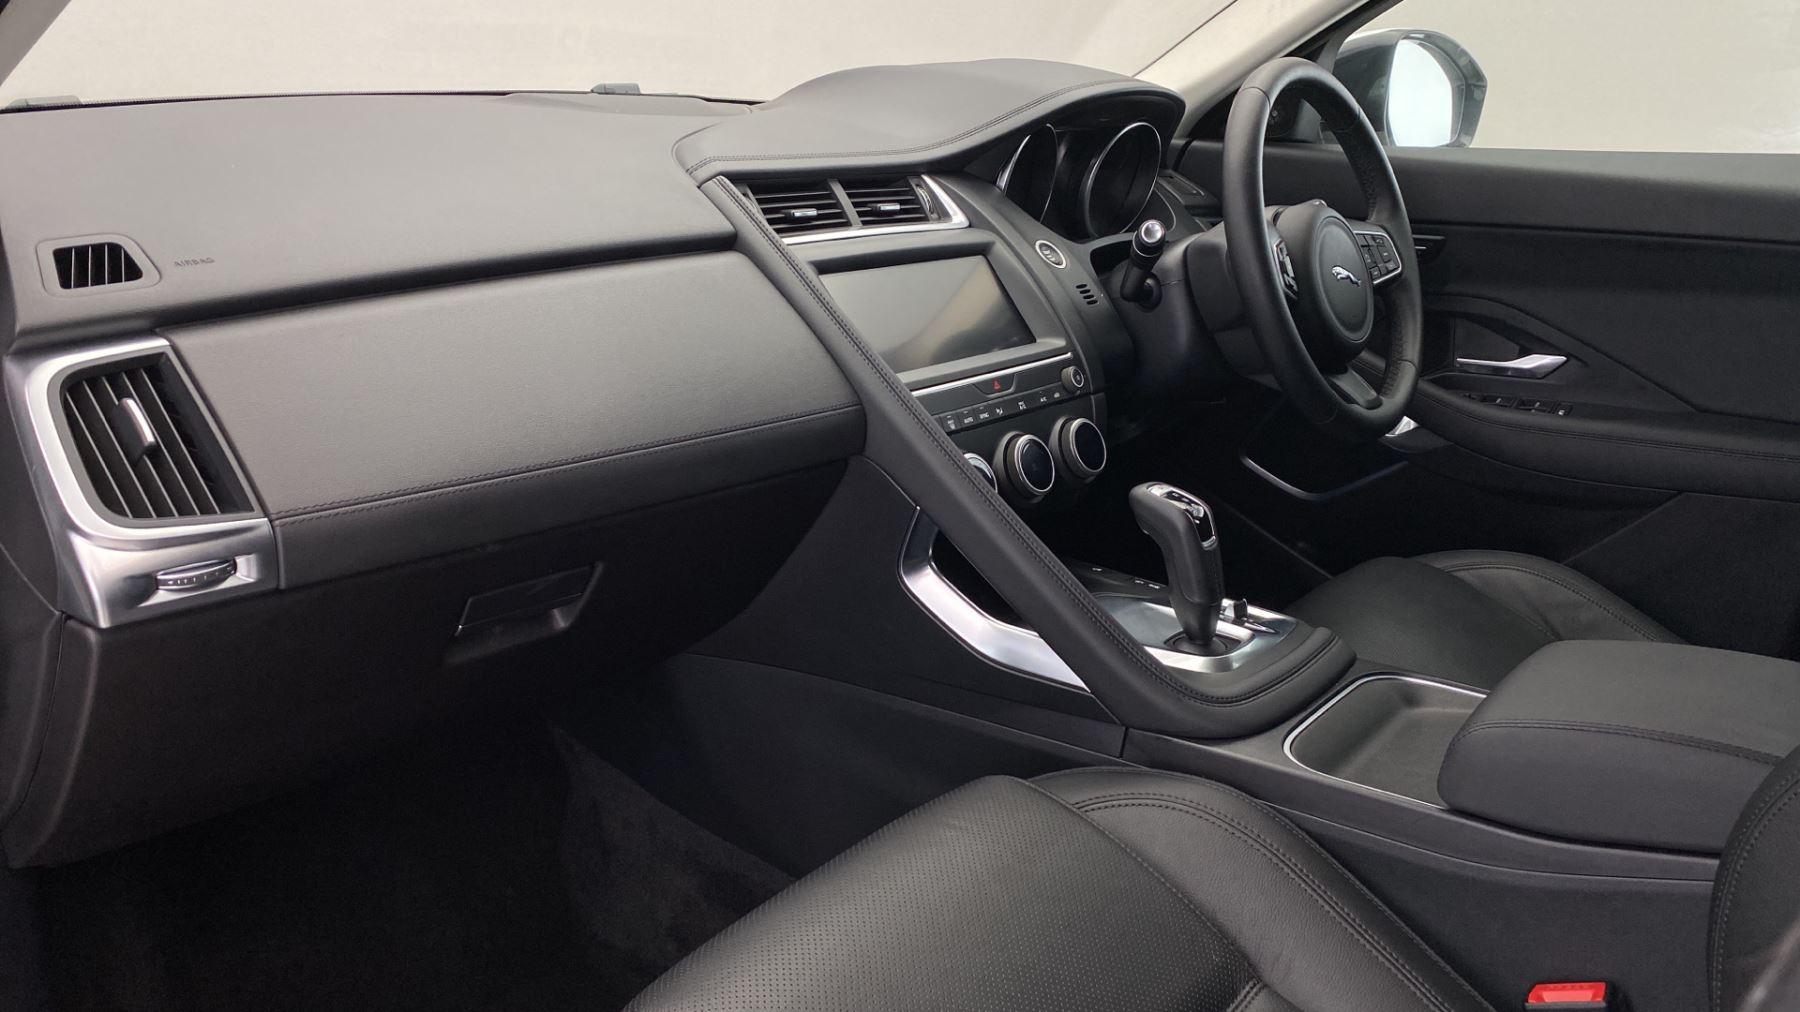 Jaguar E-PACE 2.0d SE AWD - Meridian Sound System - Powered Seats - Satellite Navigation image 10